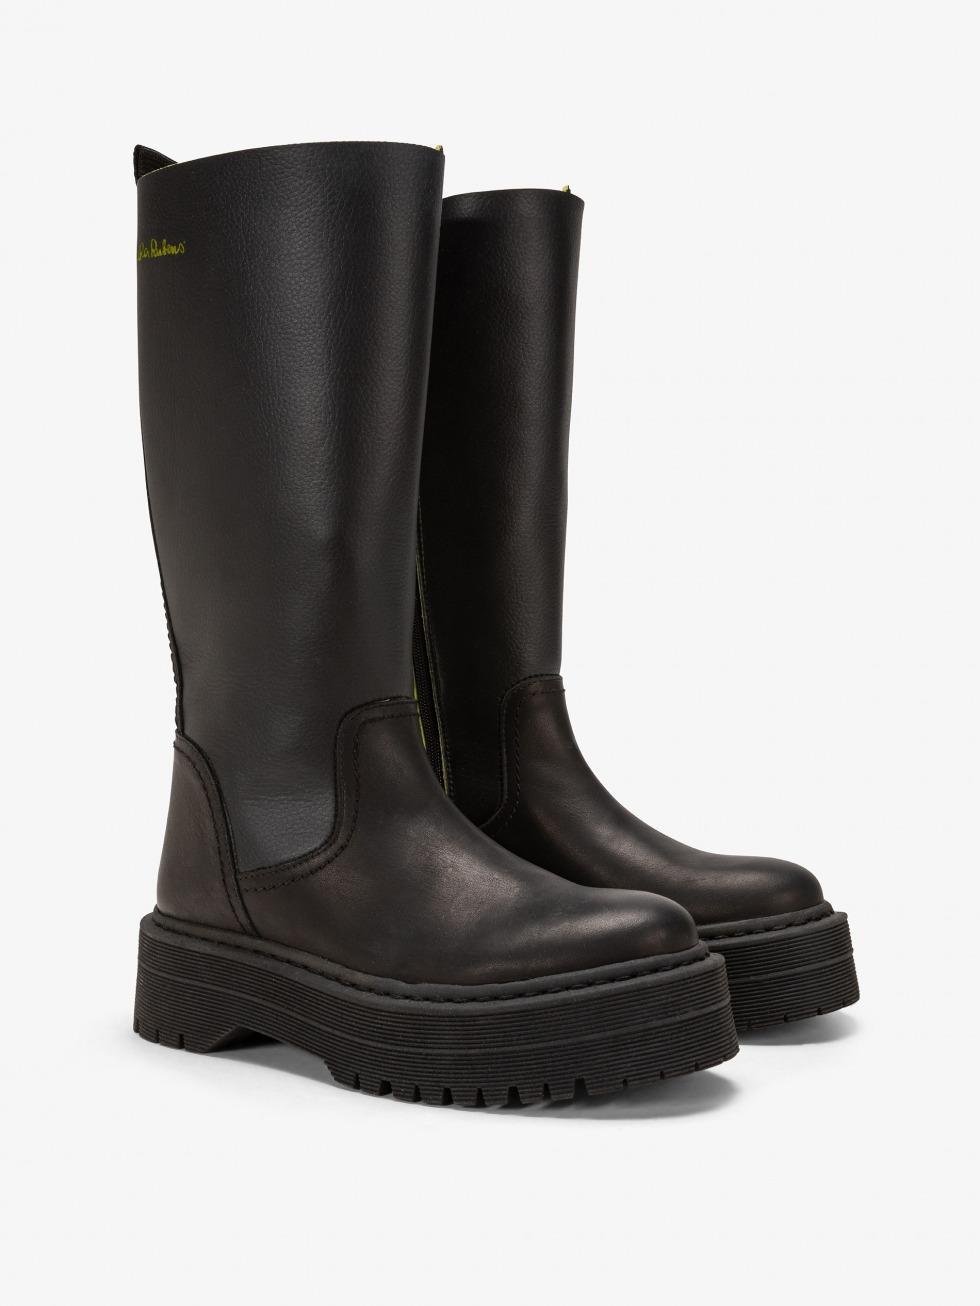 Frozen Top Boot - Rebel Black Lime